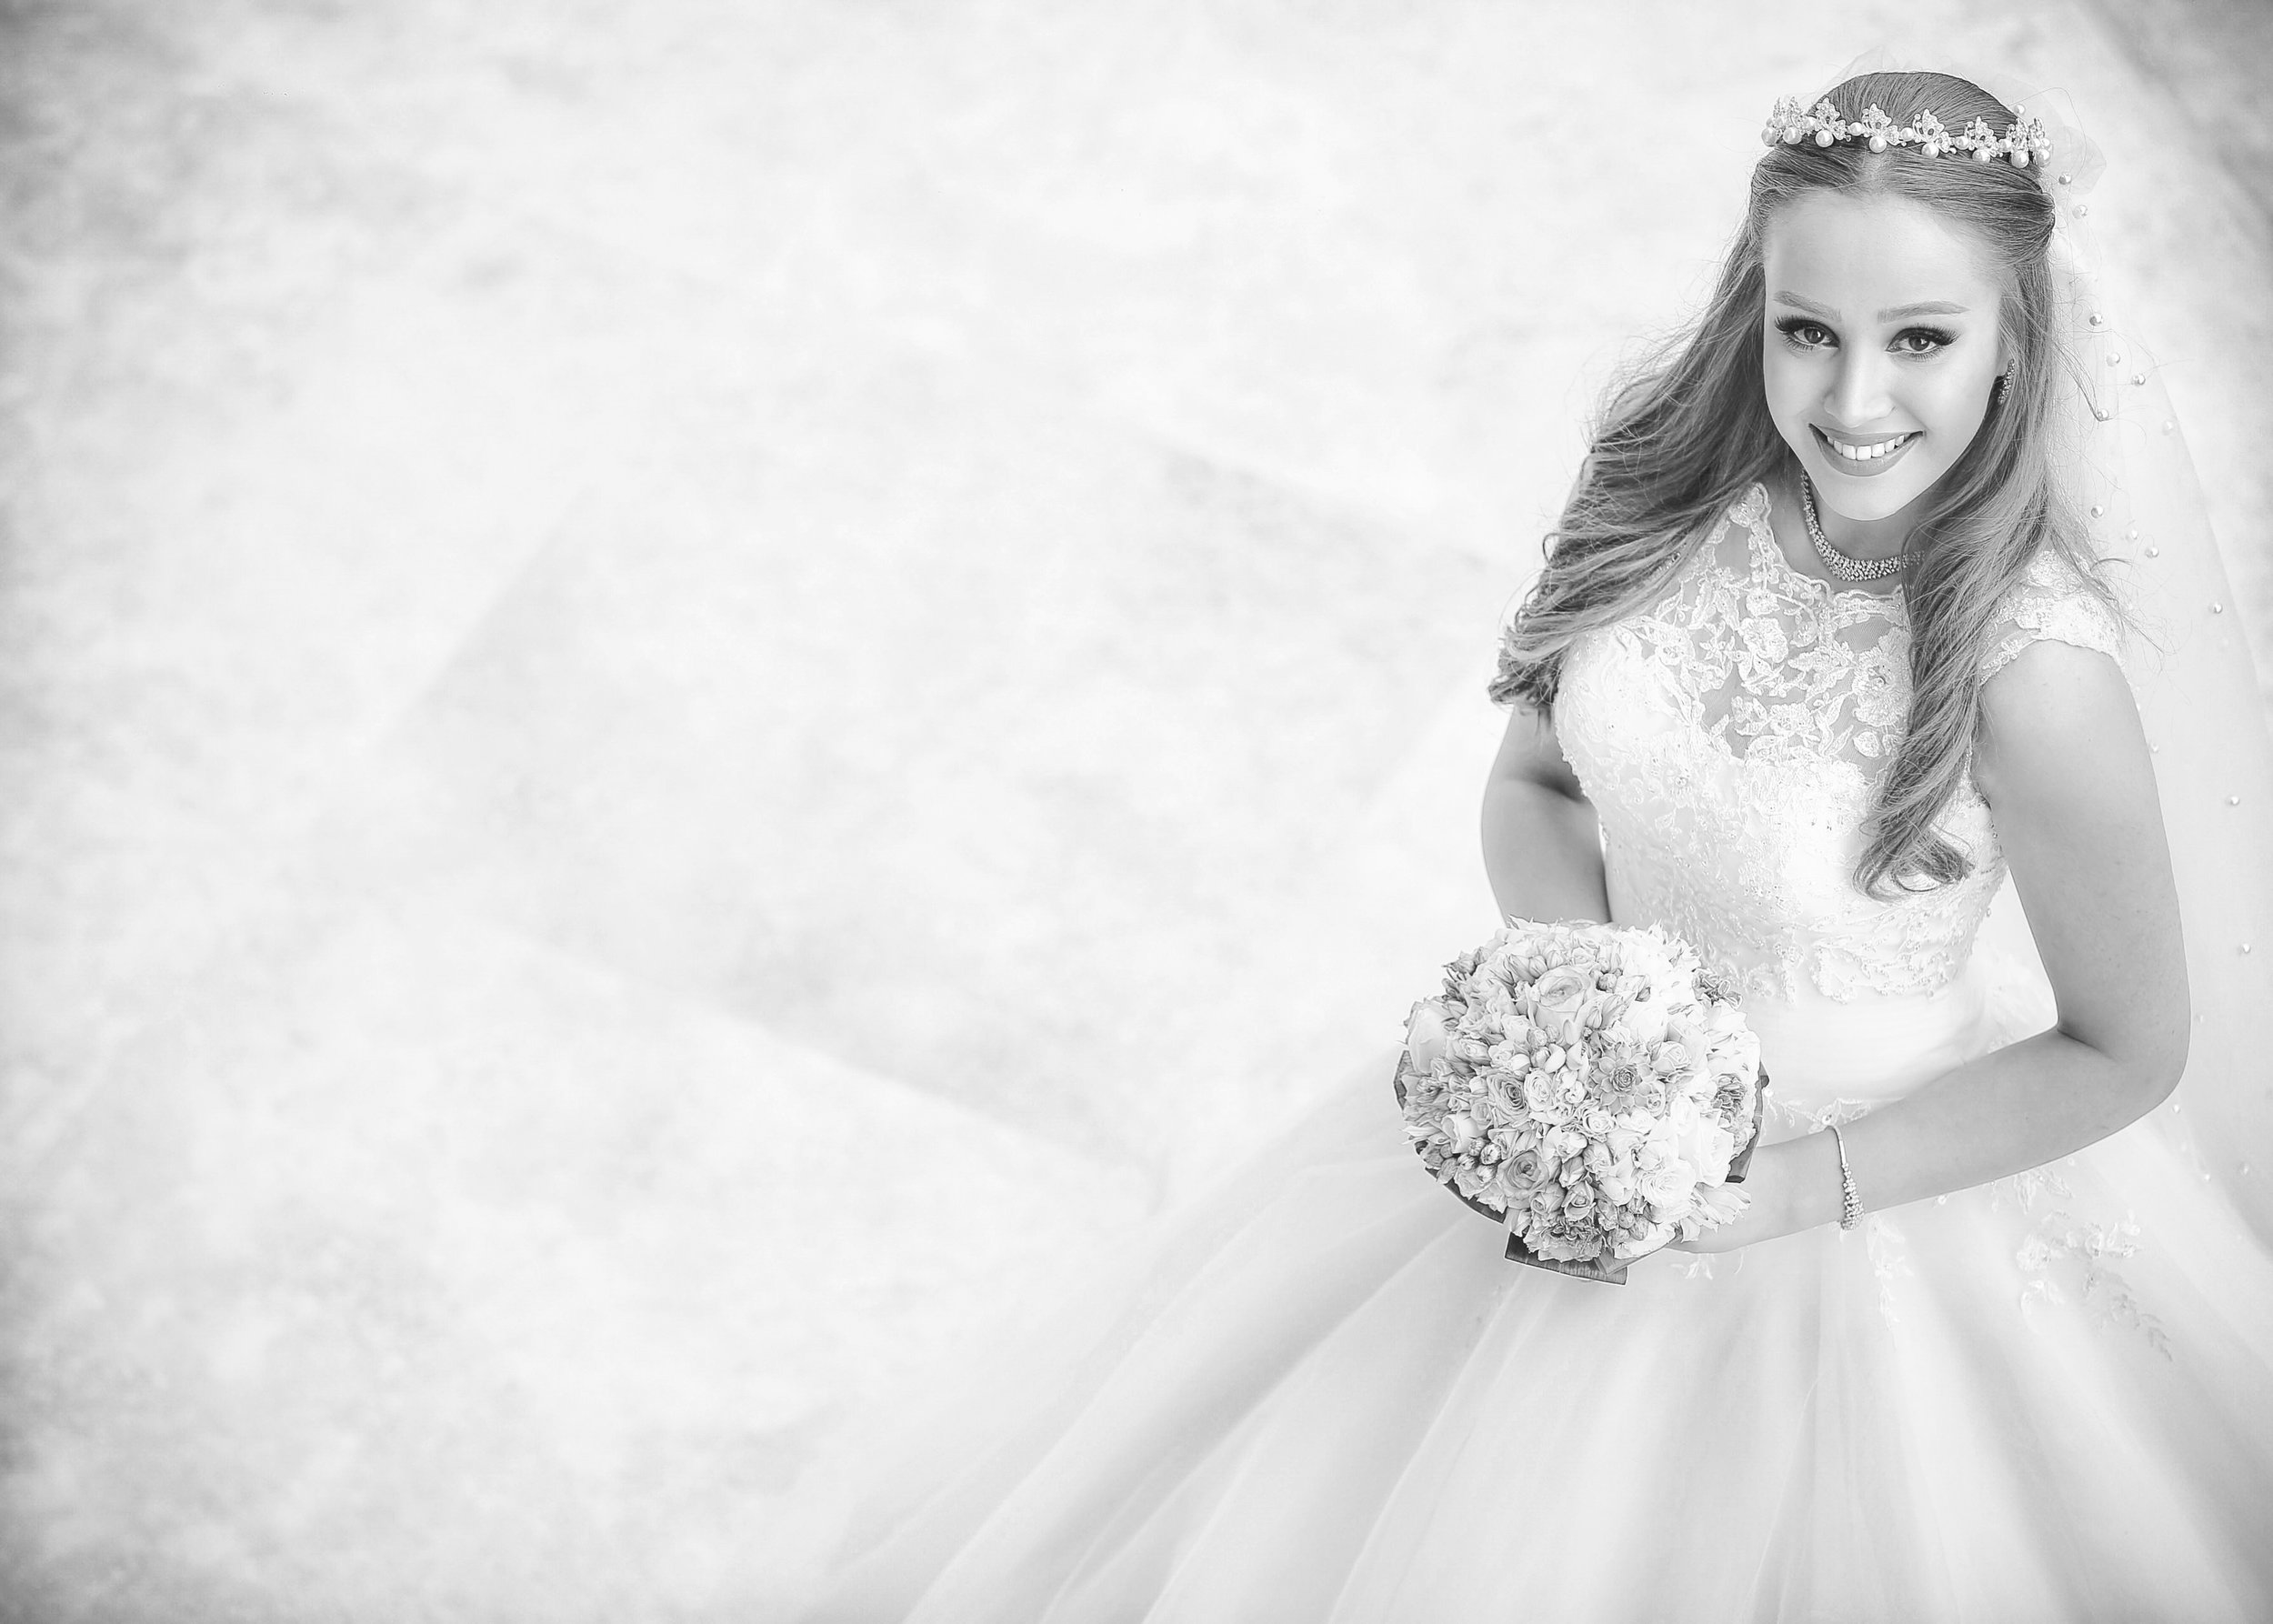 wedding-photography-Miami-Fort-lauderdale-0024.jpg